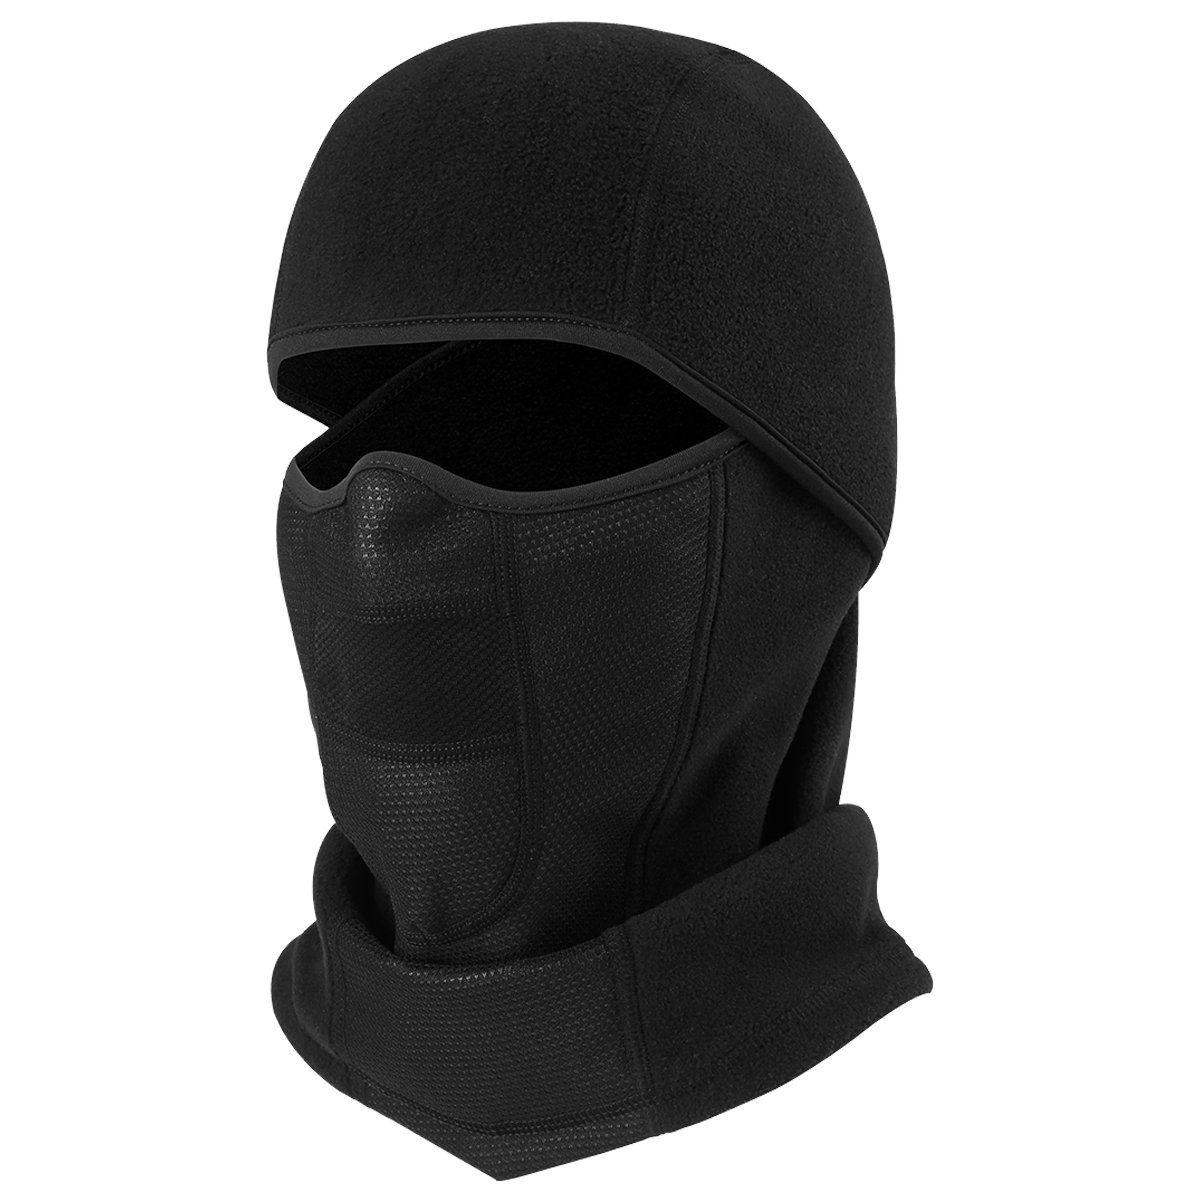 BLACK POLAR FLEECE THERMAL BALACLAVA army military open face mask ski head cover